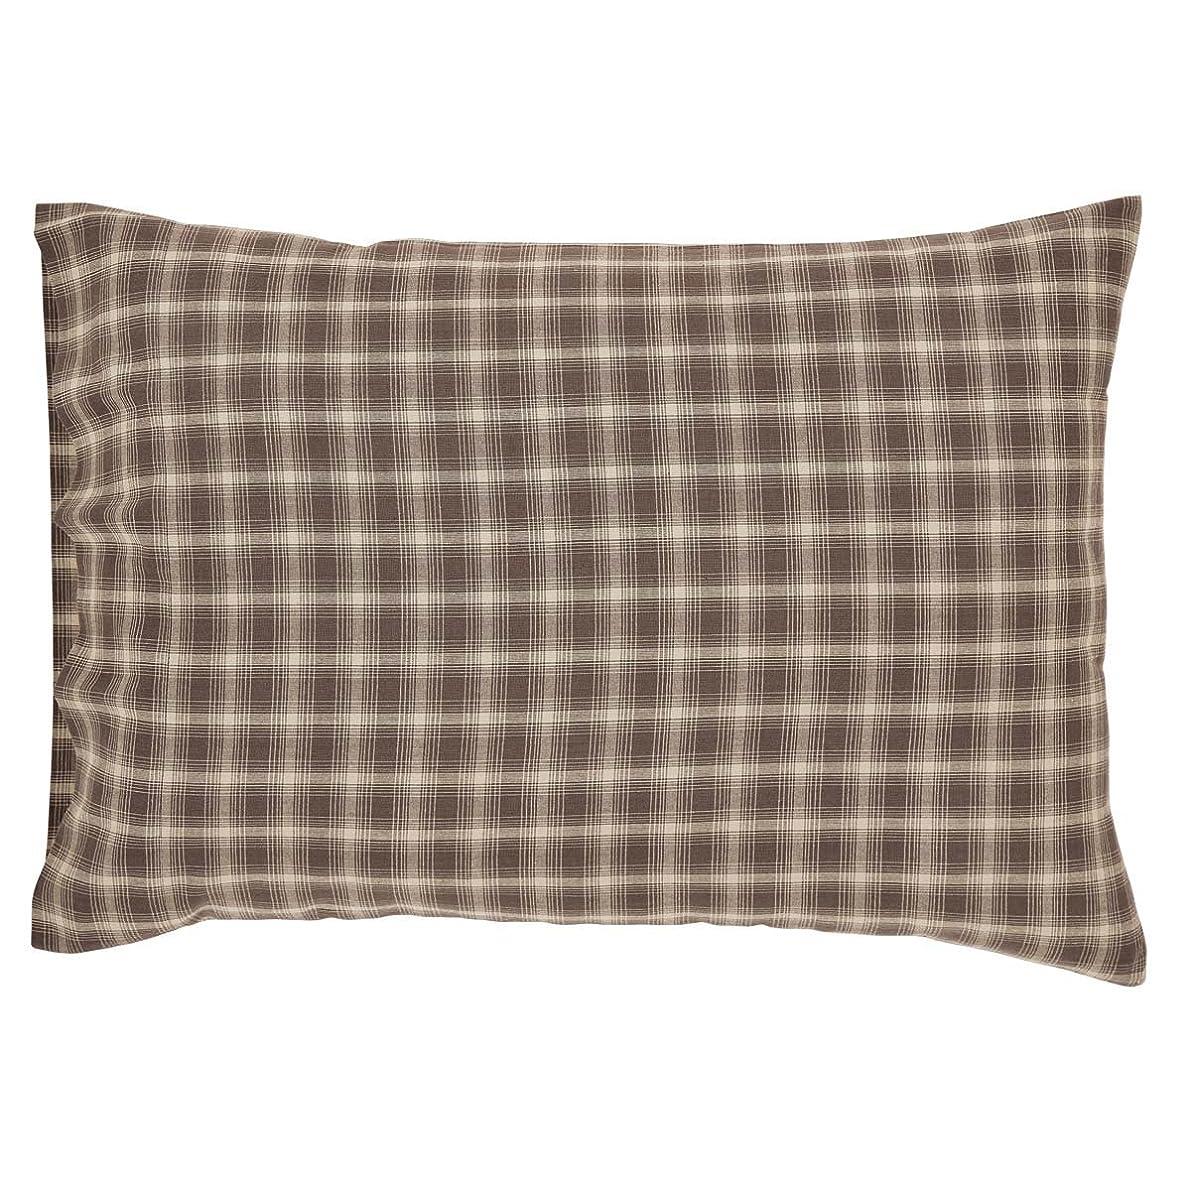 VHC Brands Dawson Star 29407 Pillow Case Set